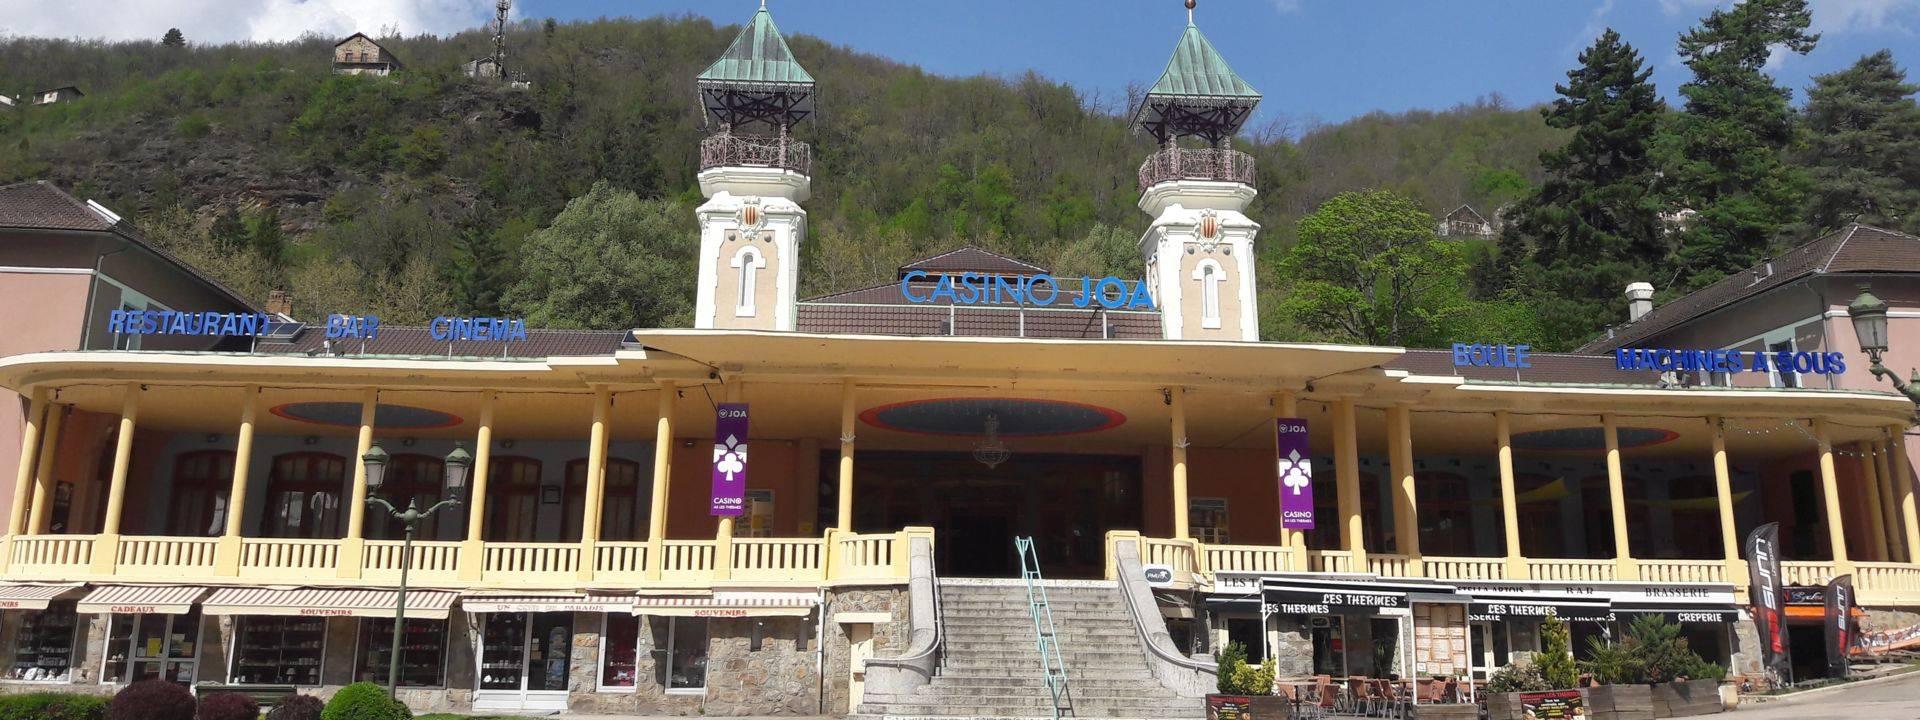 Casino ax les thermes poker tournoi ept poker locations